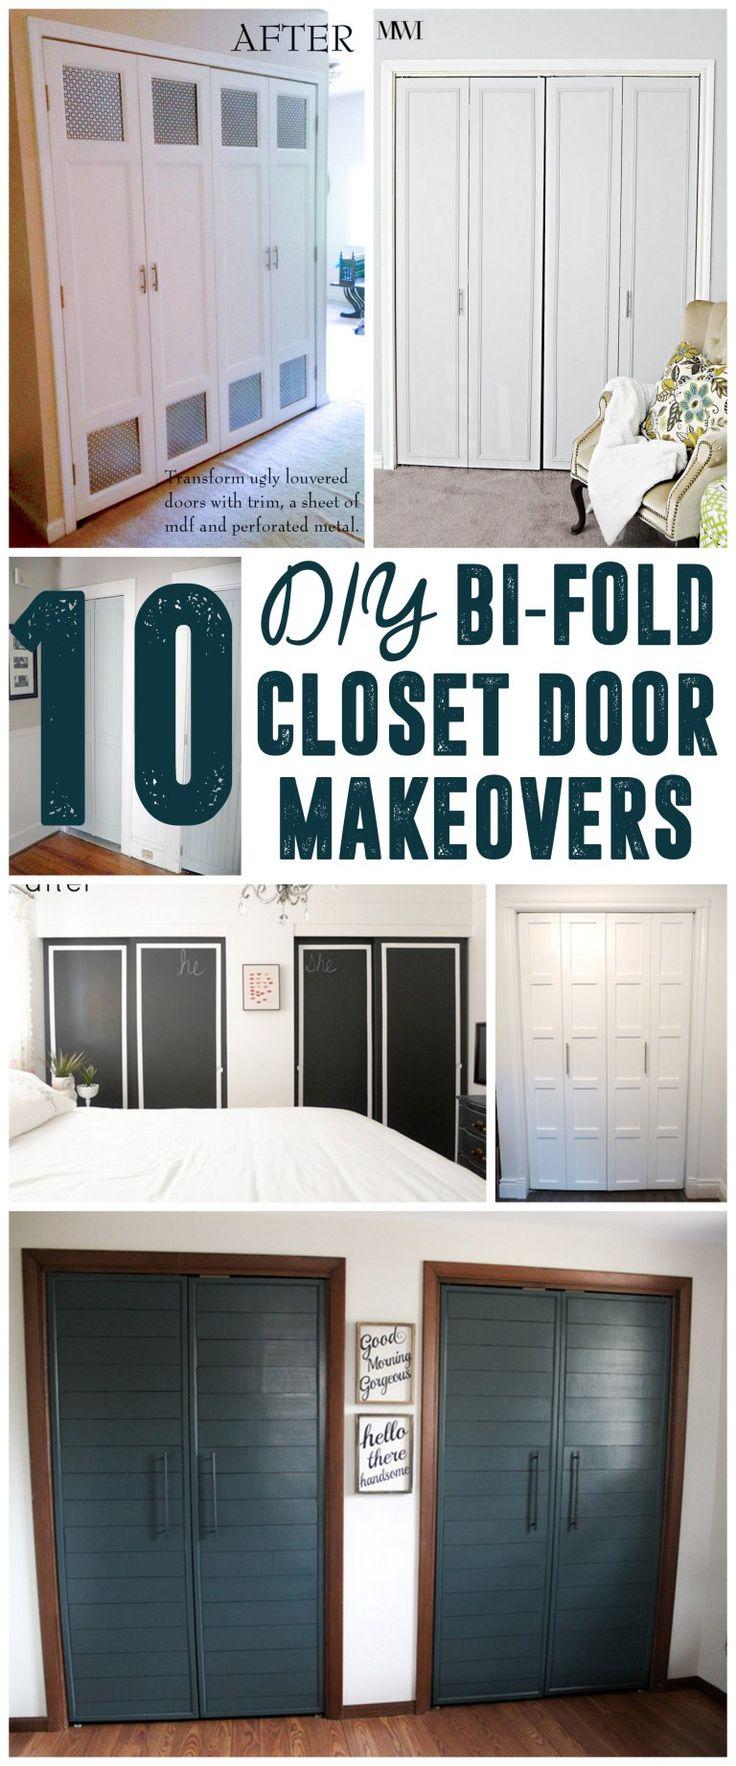 Best 25+ Closet door makeover ideas on Pinterest | Closet doors ...